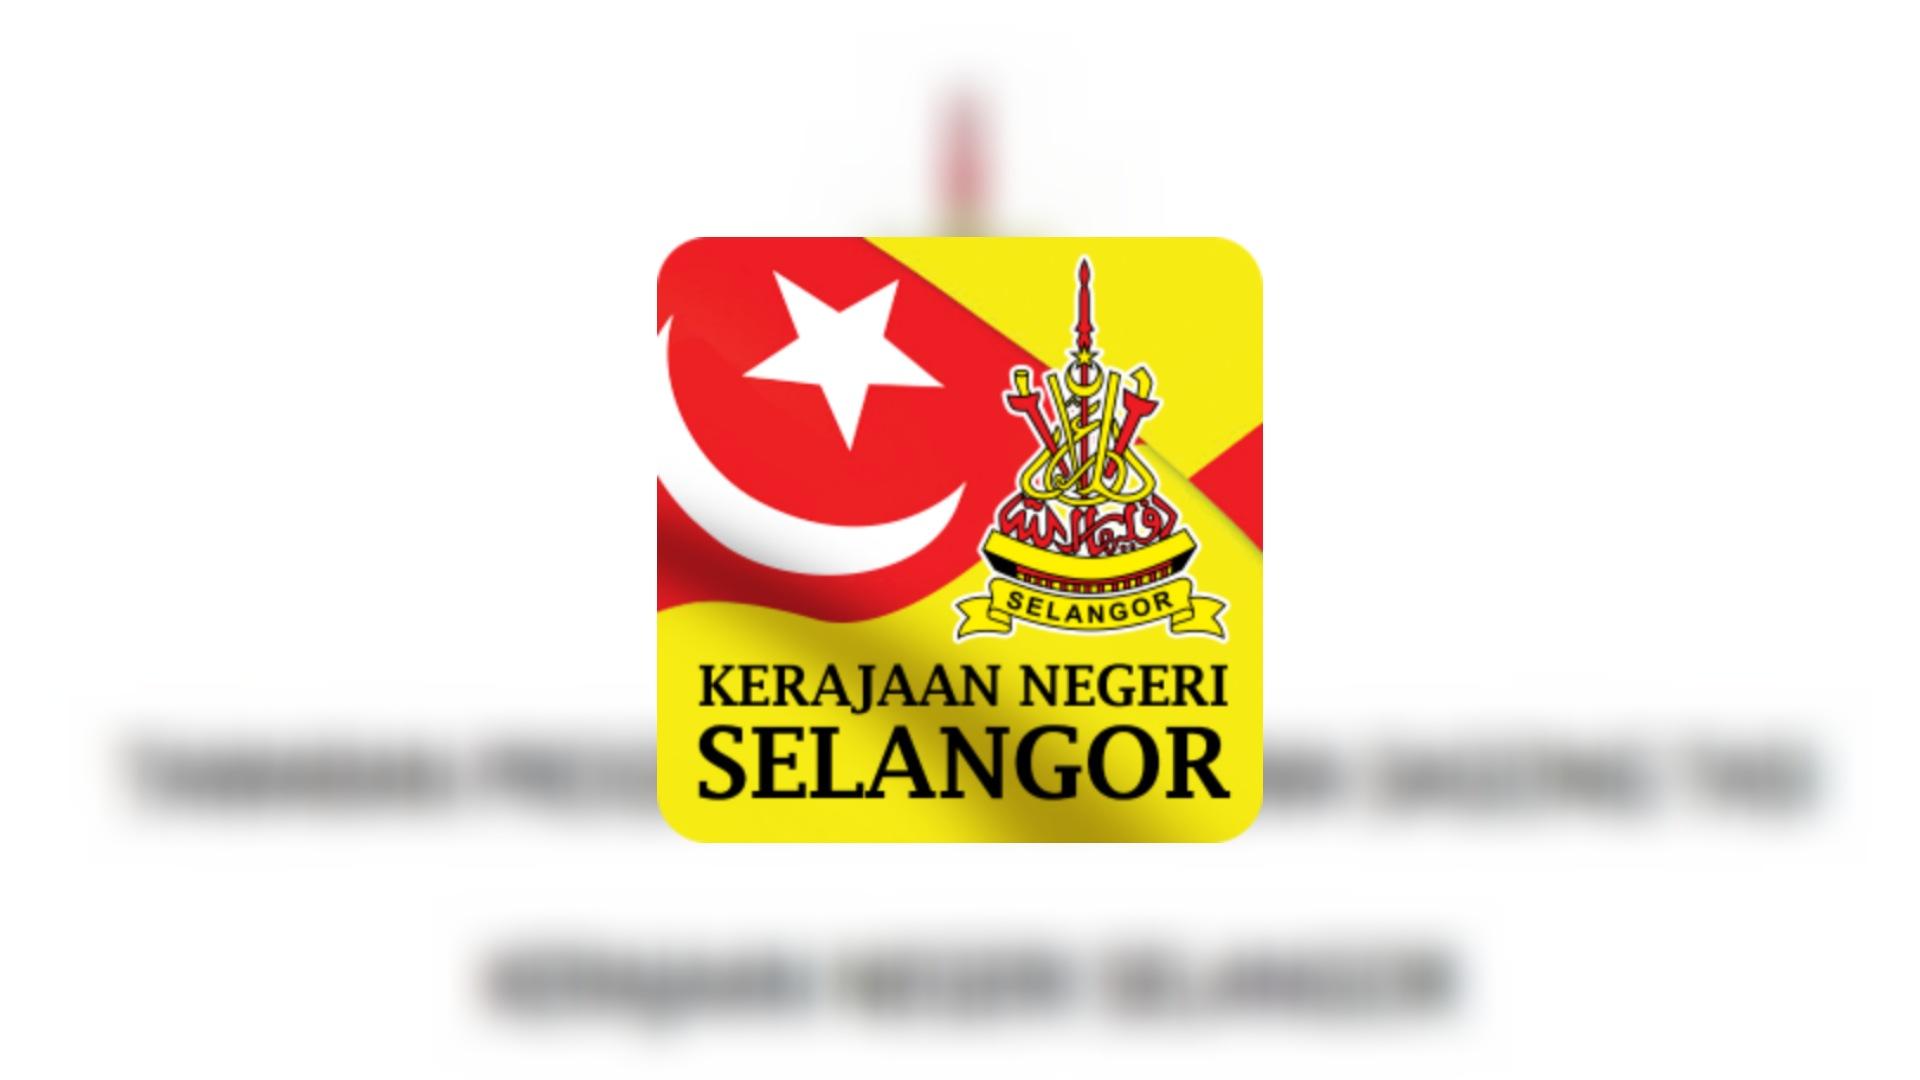 Permohonan Biasiswa Sagong Tasi 2021 Online (Semakan Keputusan)